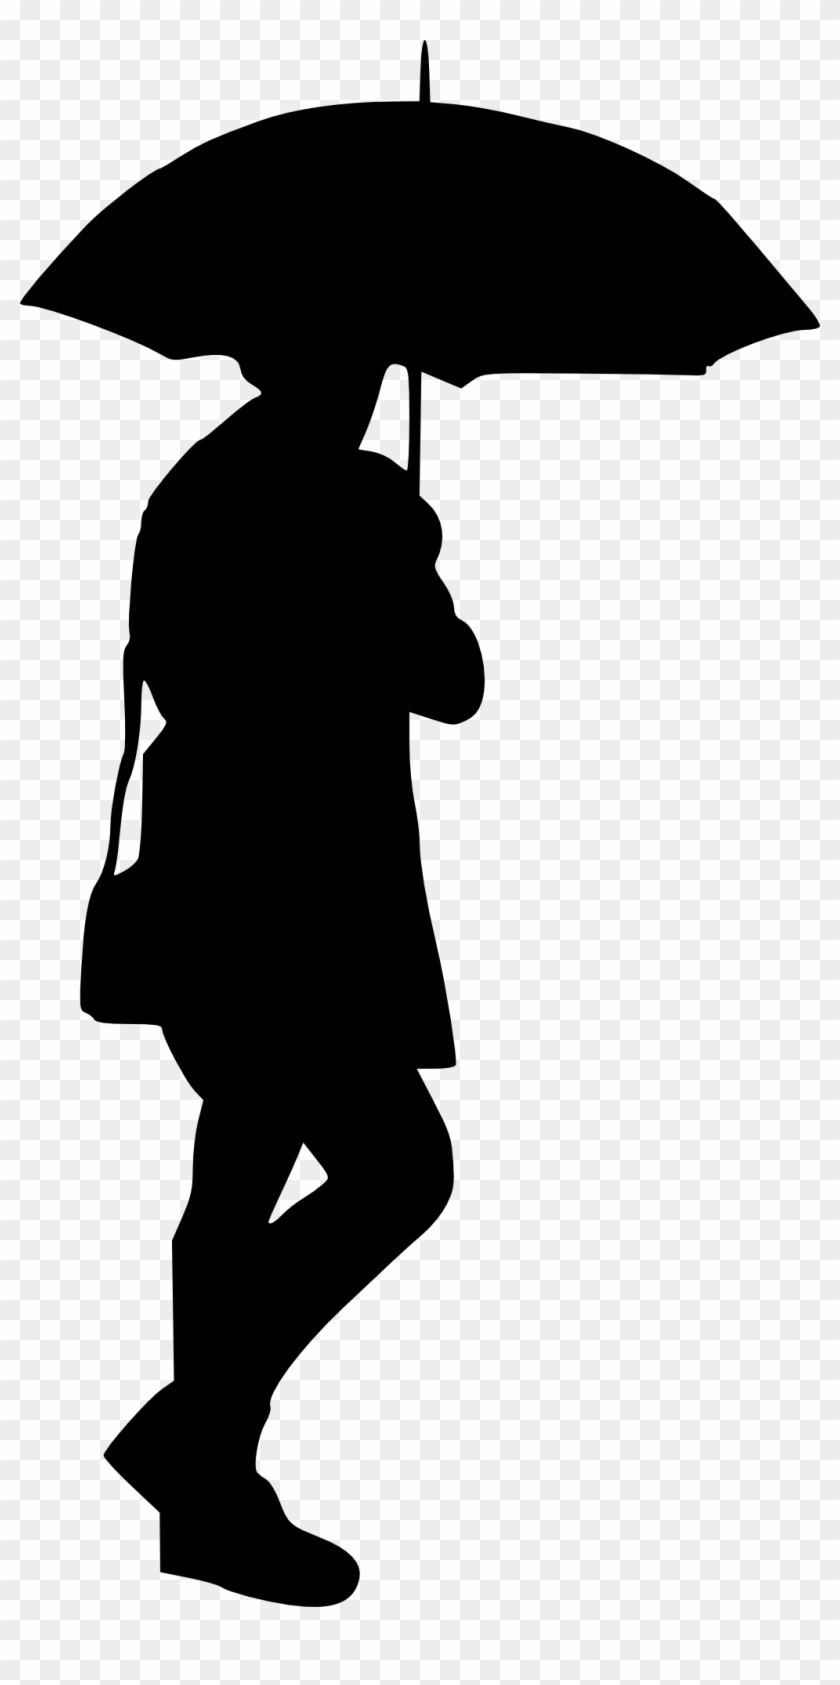 10 Woman With Umbrella Silhouette - Umbrella Silhouette Png #9077